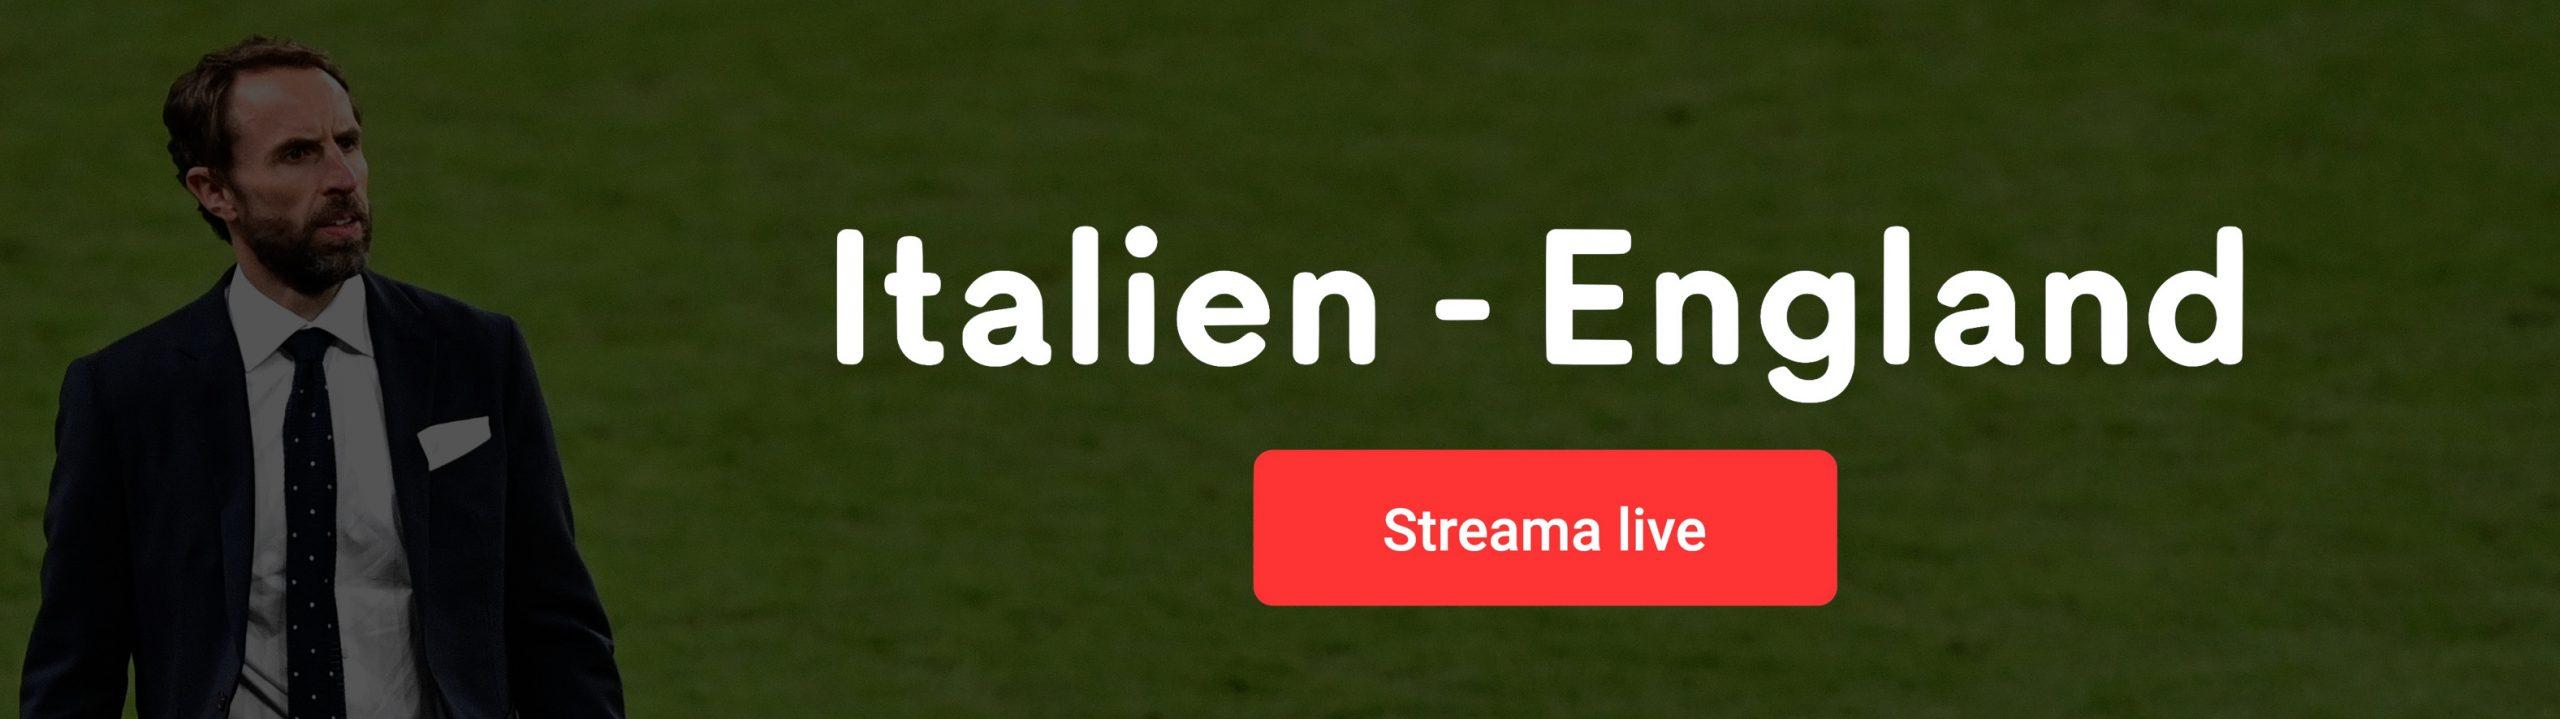 Streama Italien England live online